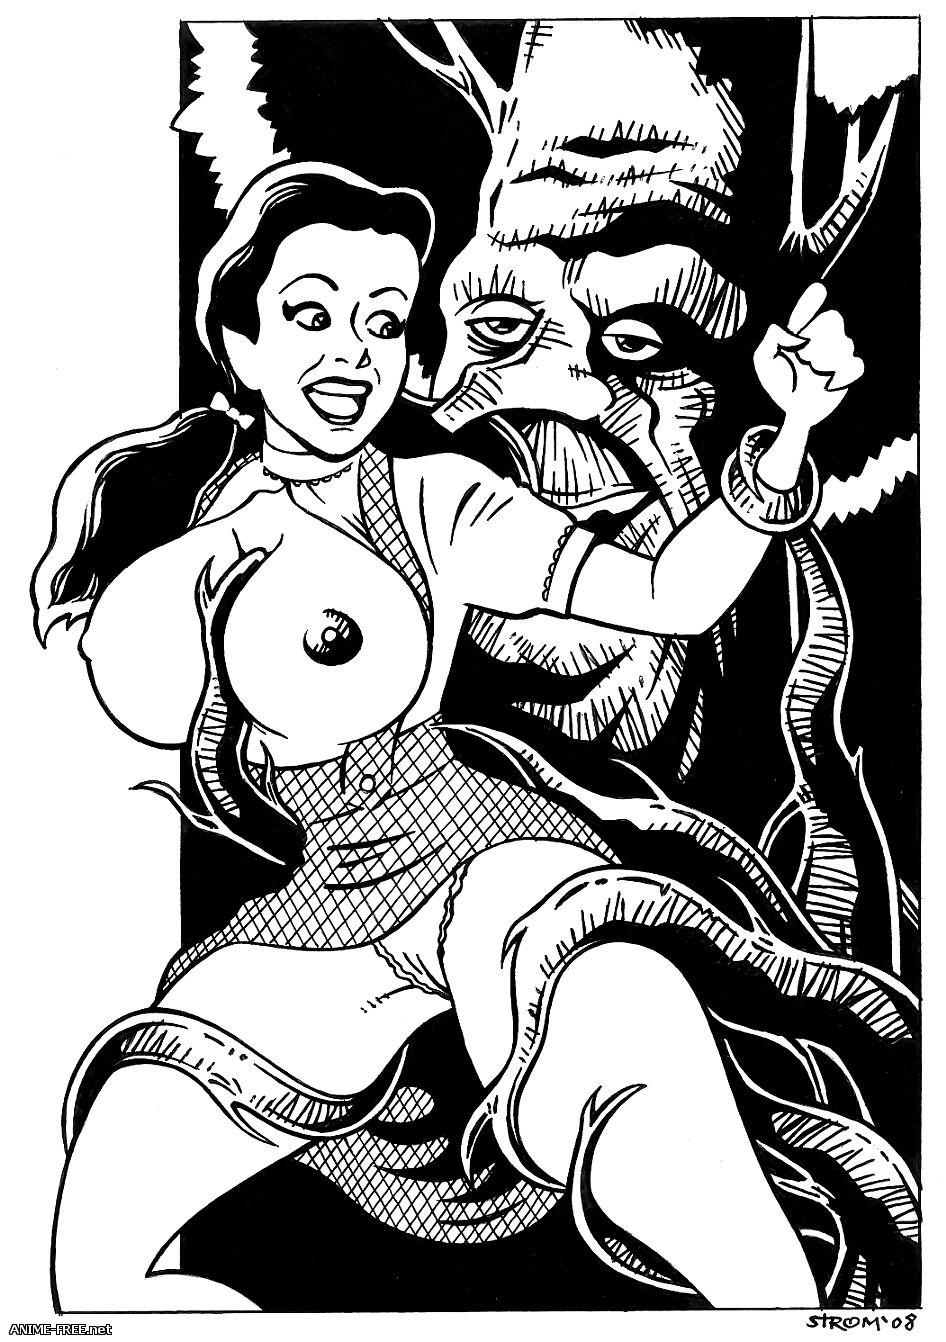 The Real Oz, The Wizard Of Ooz / Настоящая Волшебная Страна [Uncen] [RUS,ENG] Porn Comics